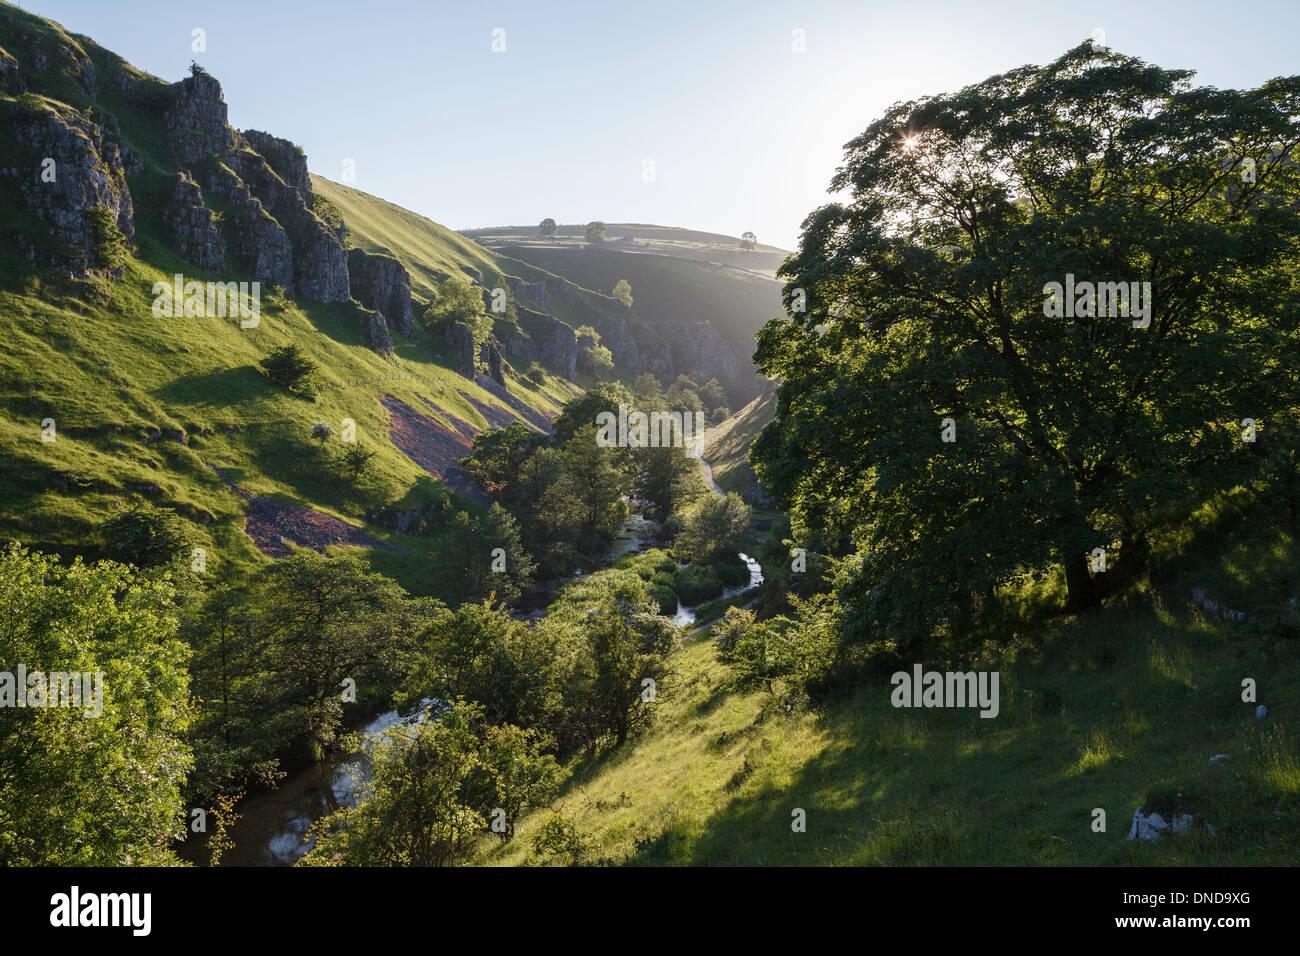 Wolfscote Dale, Dove Valley, Peak District National Park, Derbyshire - Stock Image